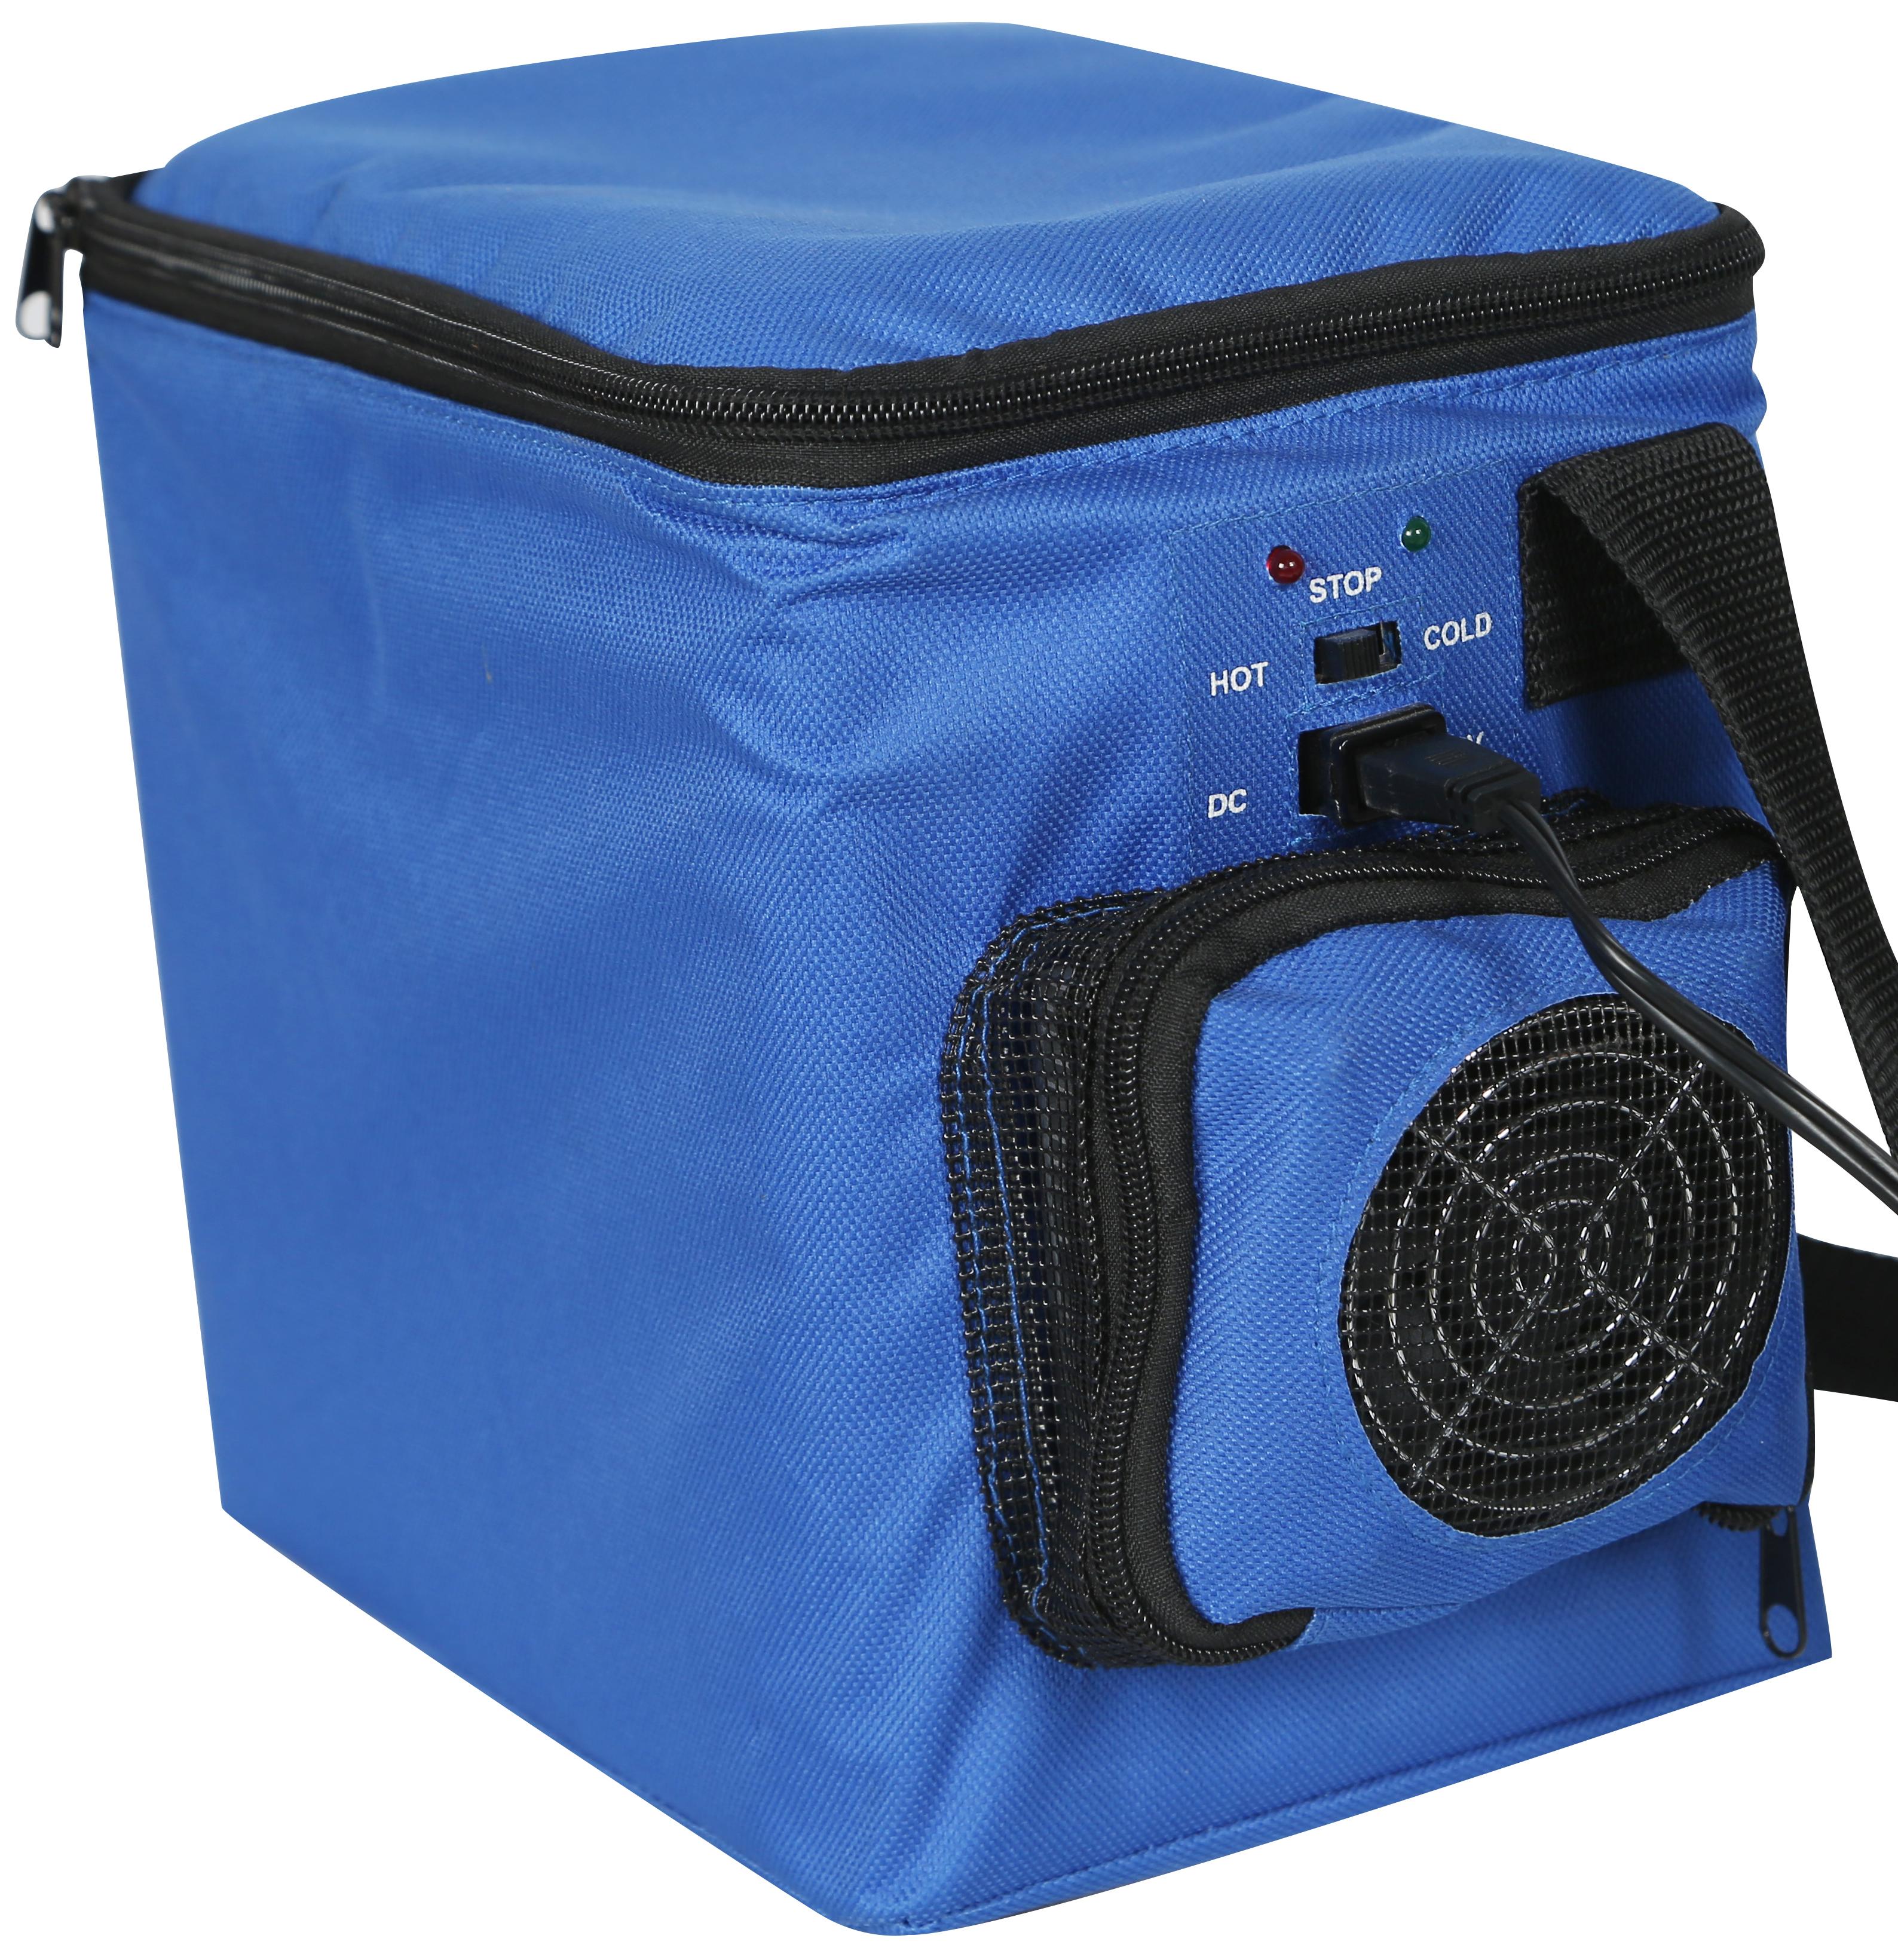 3l Electric Coolbox Cooler Hot Cold Portable Cool Box Car